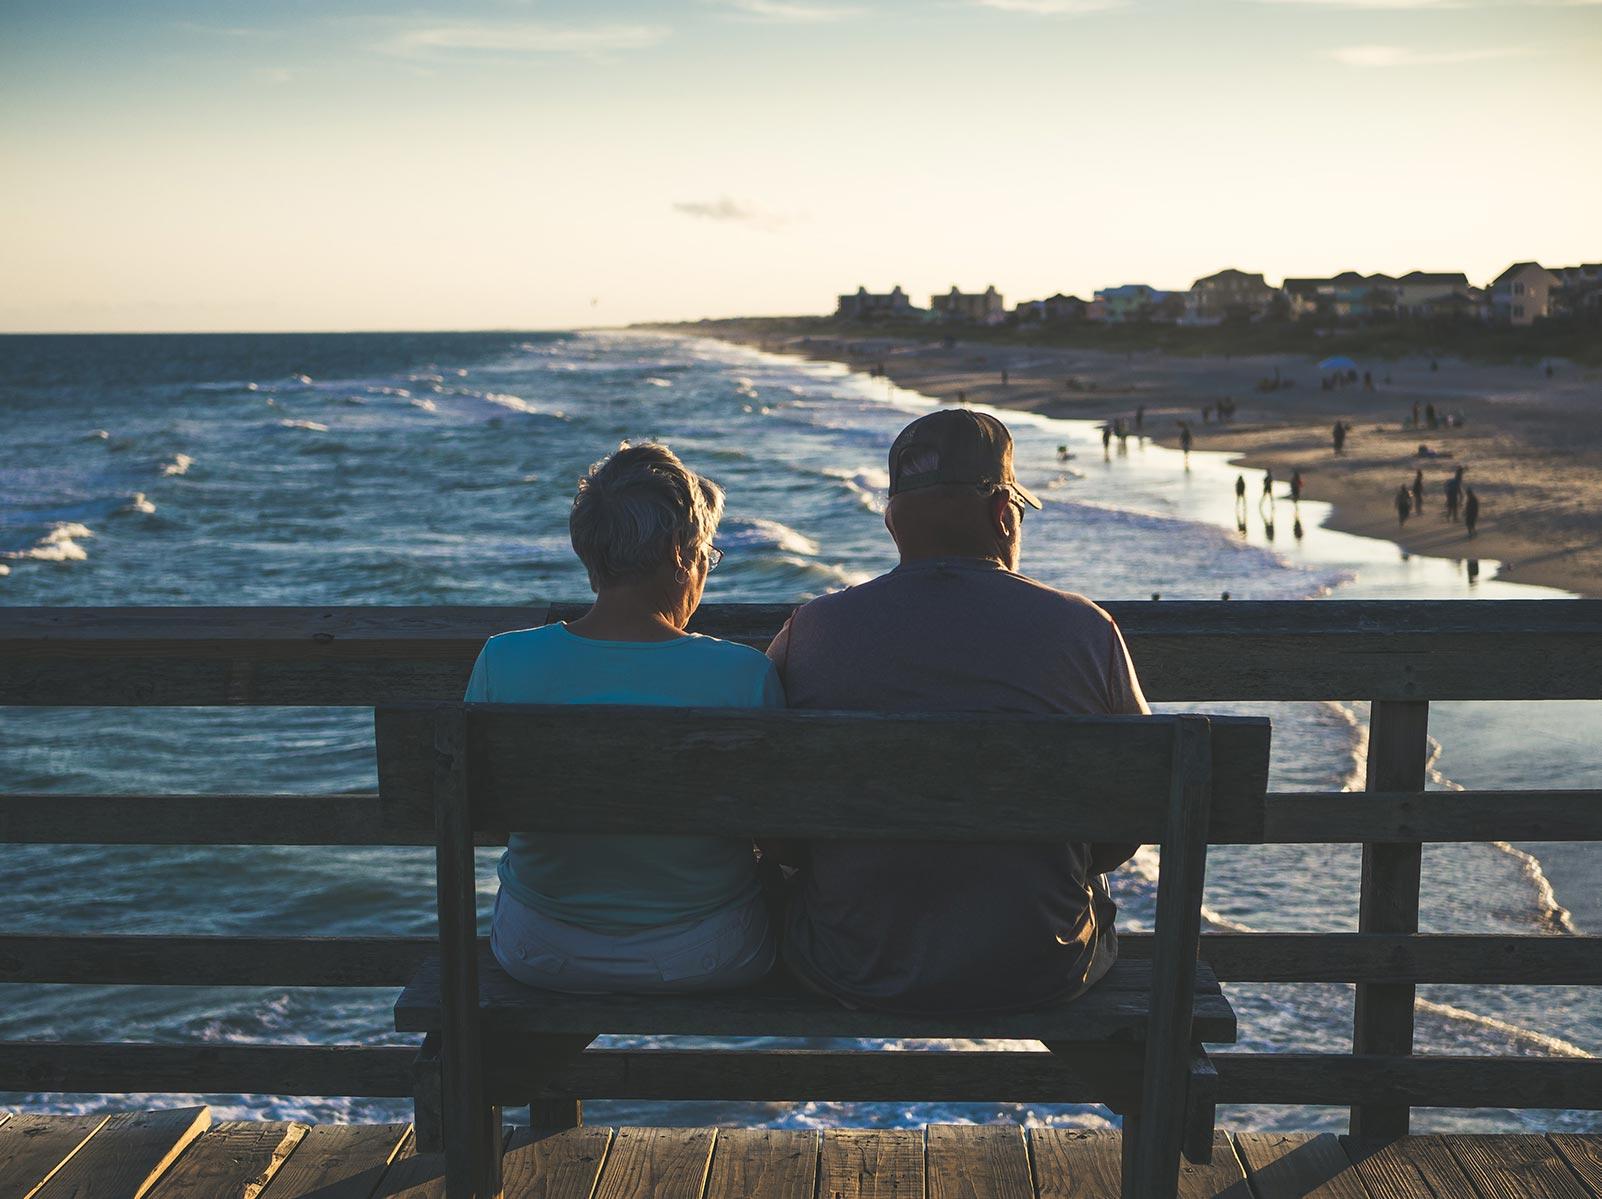 The Pension Series: Lifetime allowance pension advice